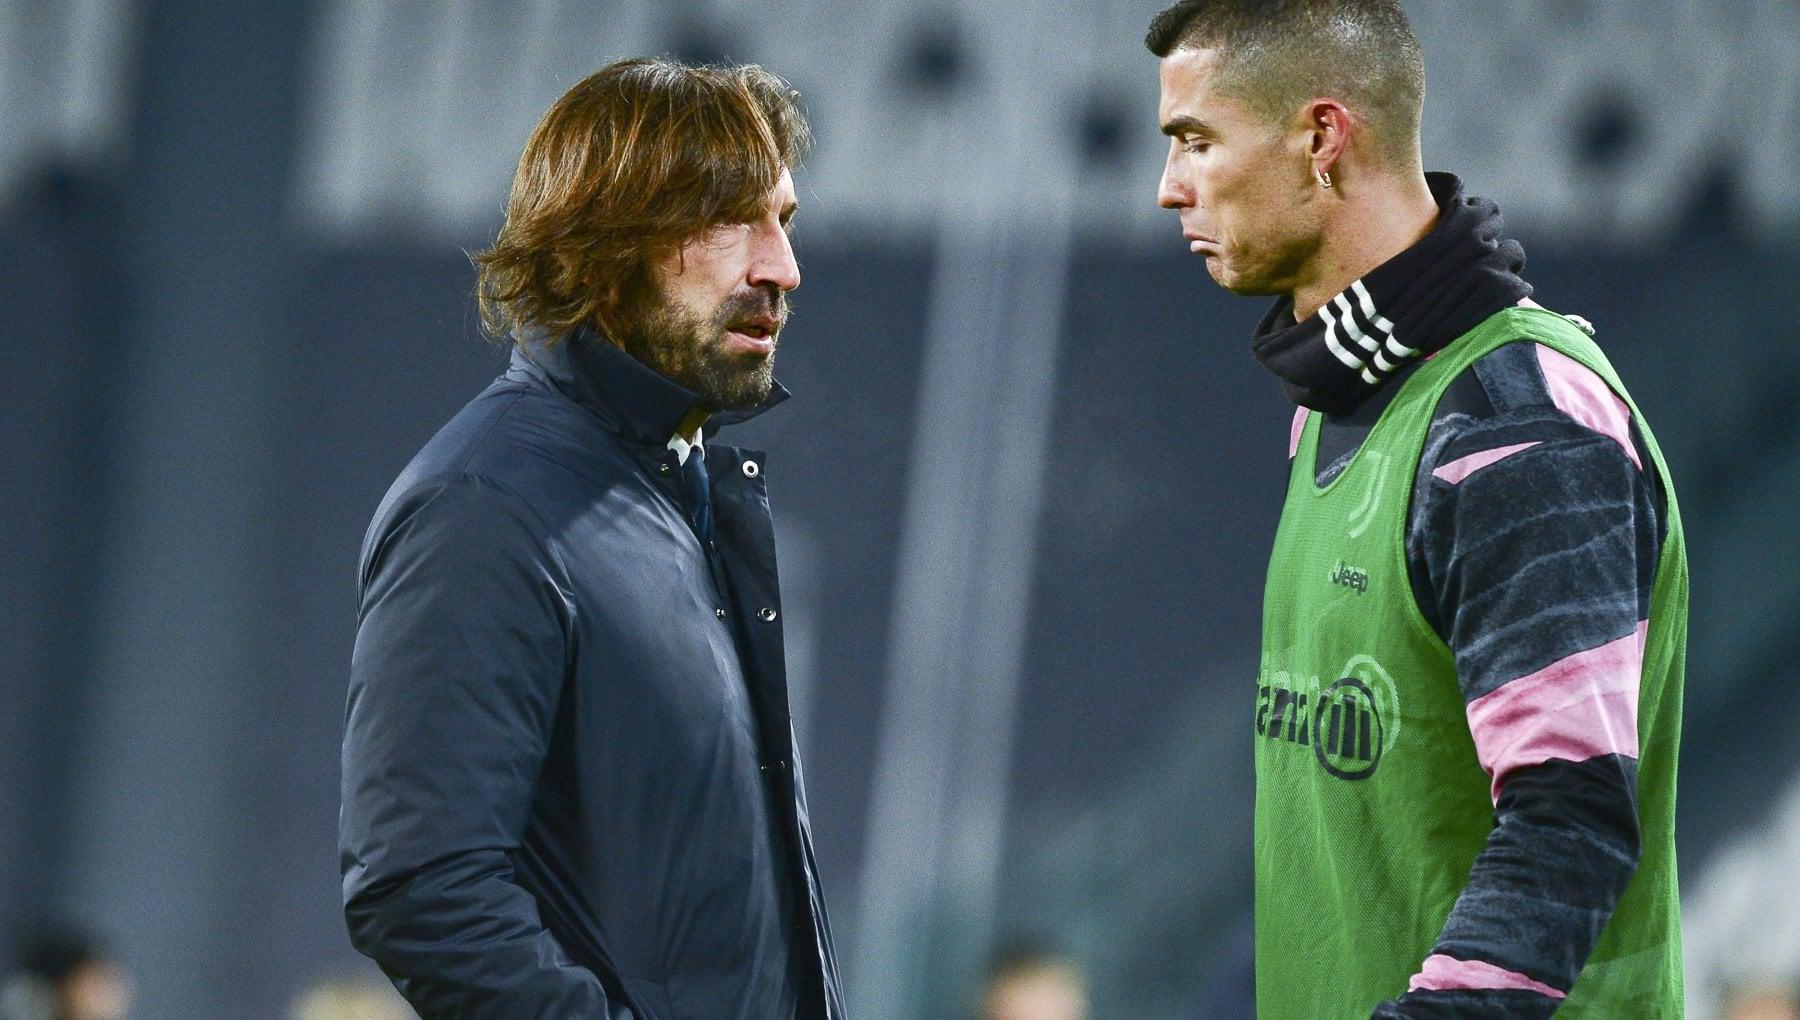 Supercoppa, Juventus: out anche Demiral, emergenza in difesa per Pirlo